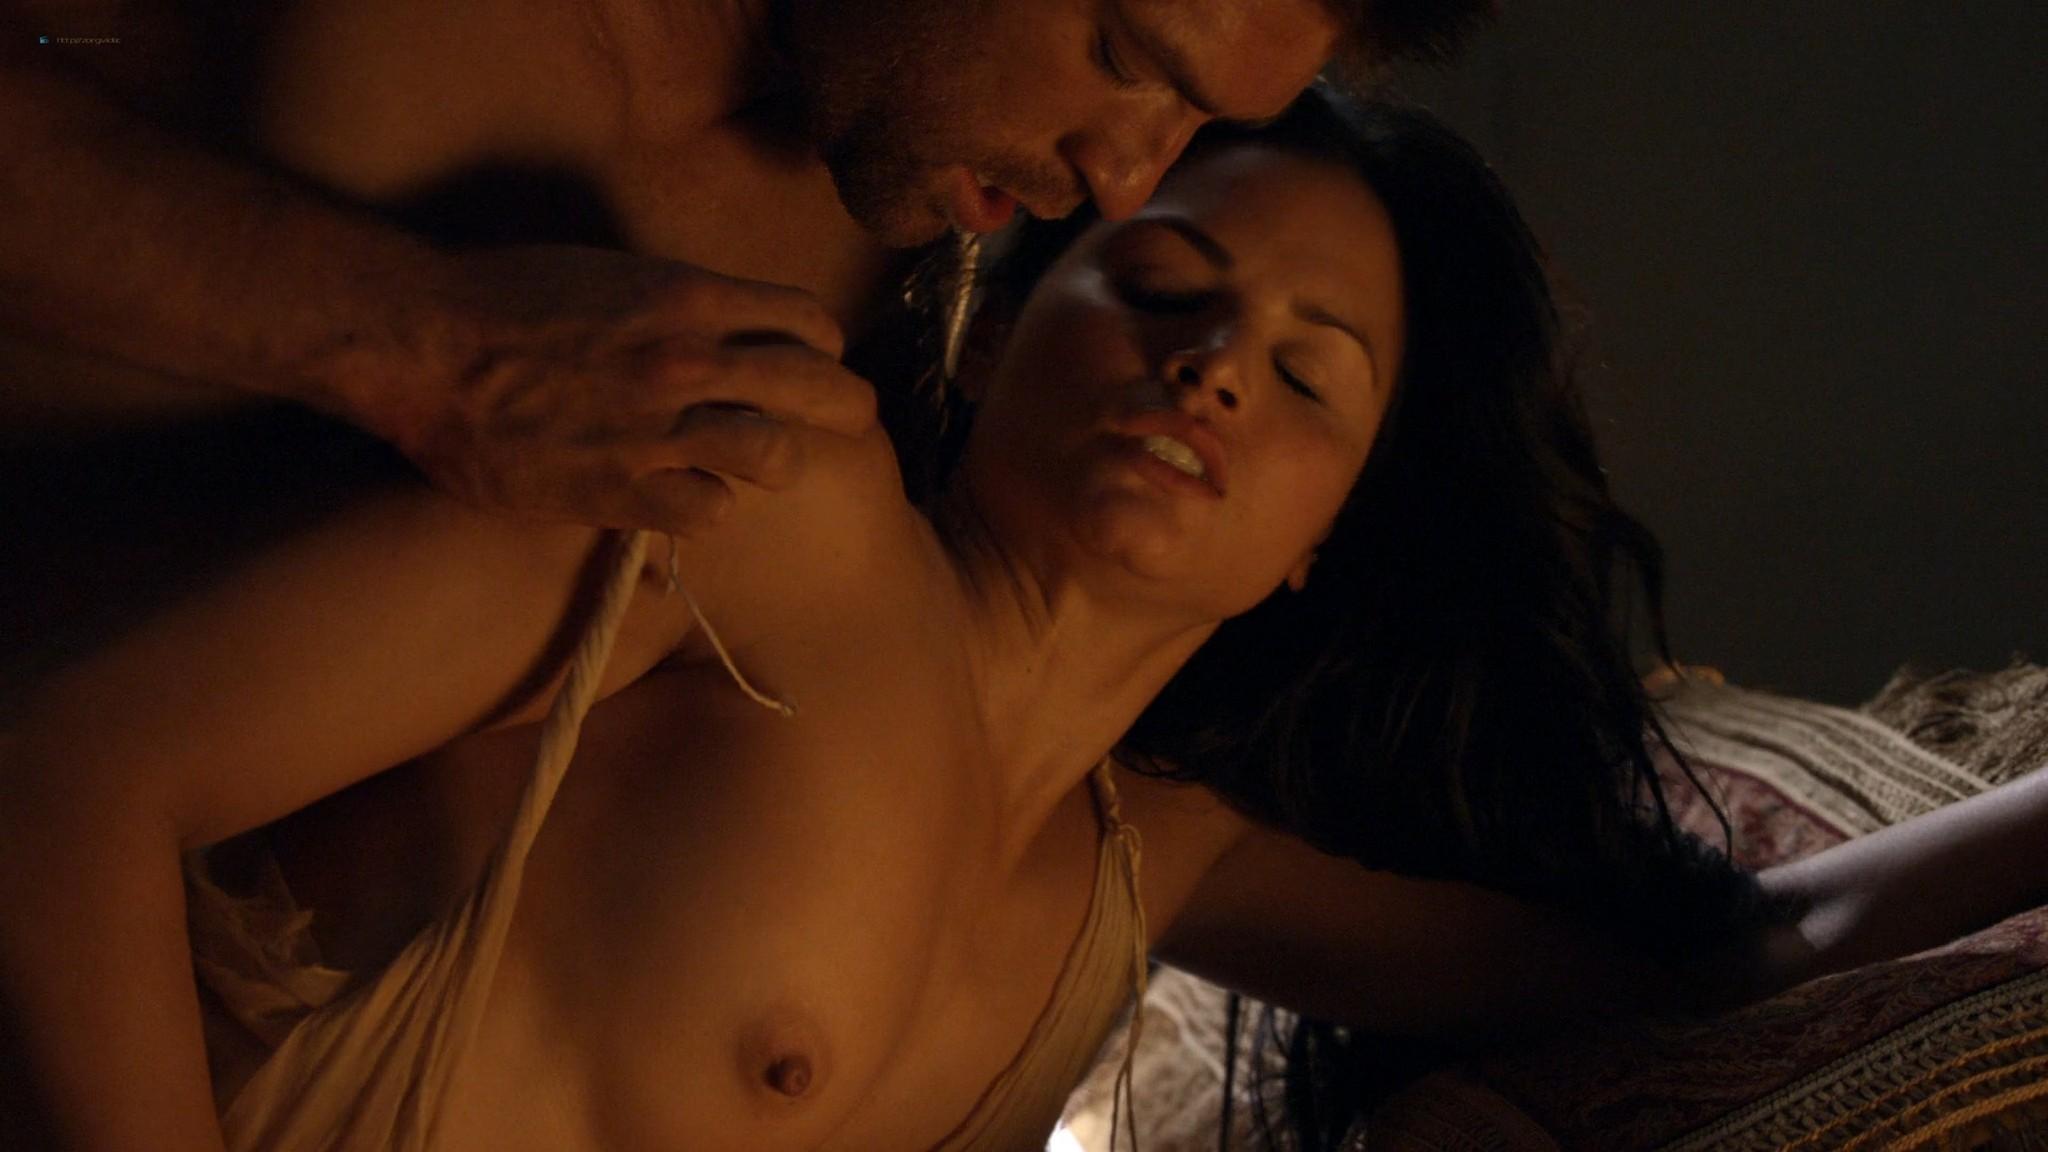 Viva Bianca nude topless Katrina Law, Bonnie Sveen, etc -Spartacus - Vengeance (2012) e3 1080p (11)